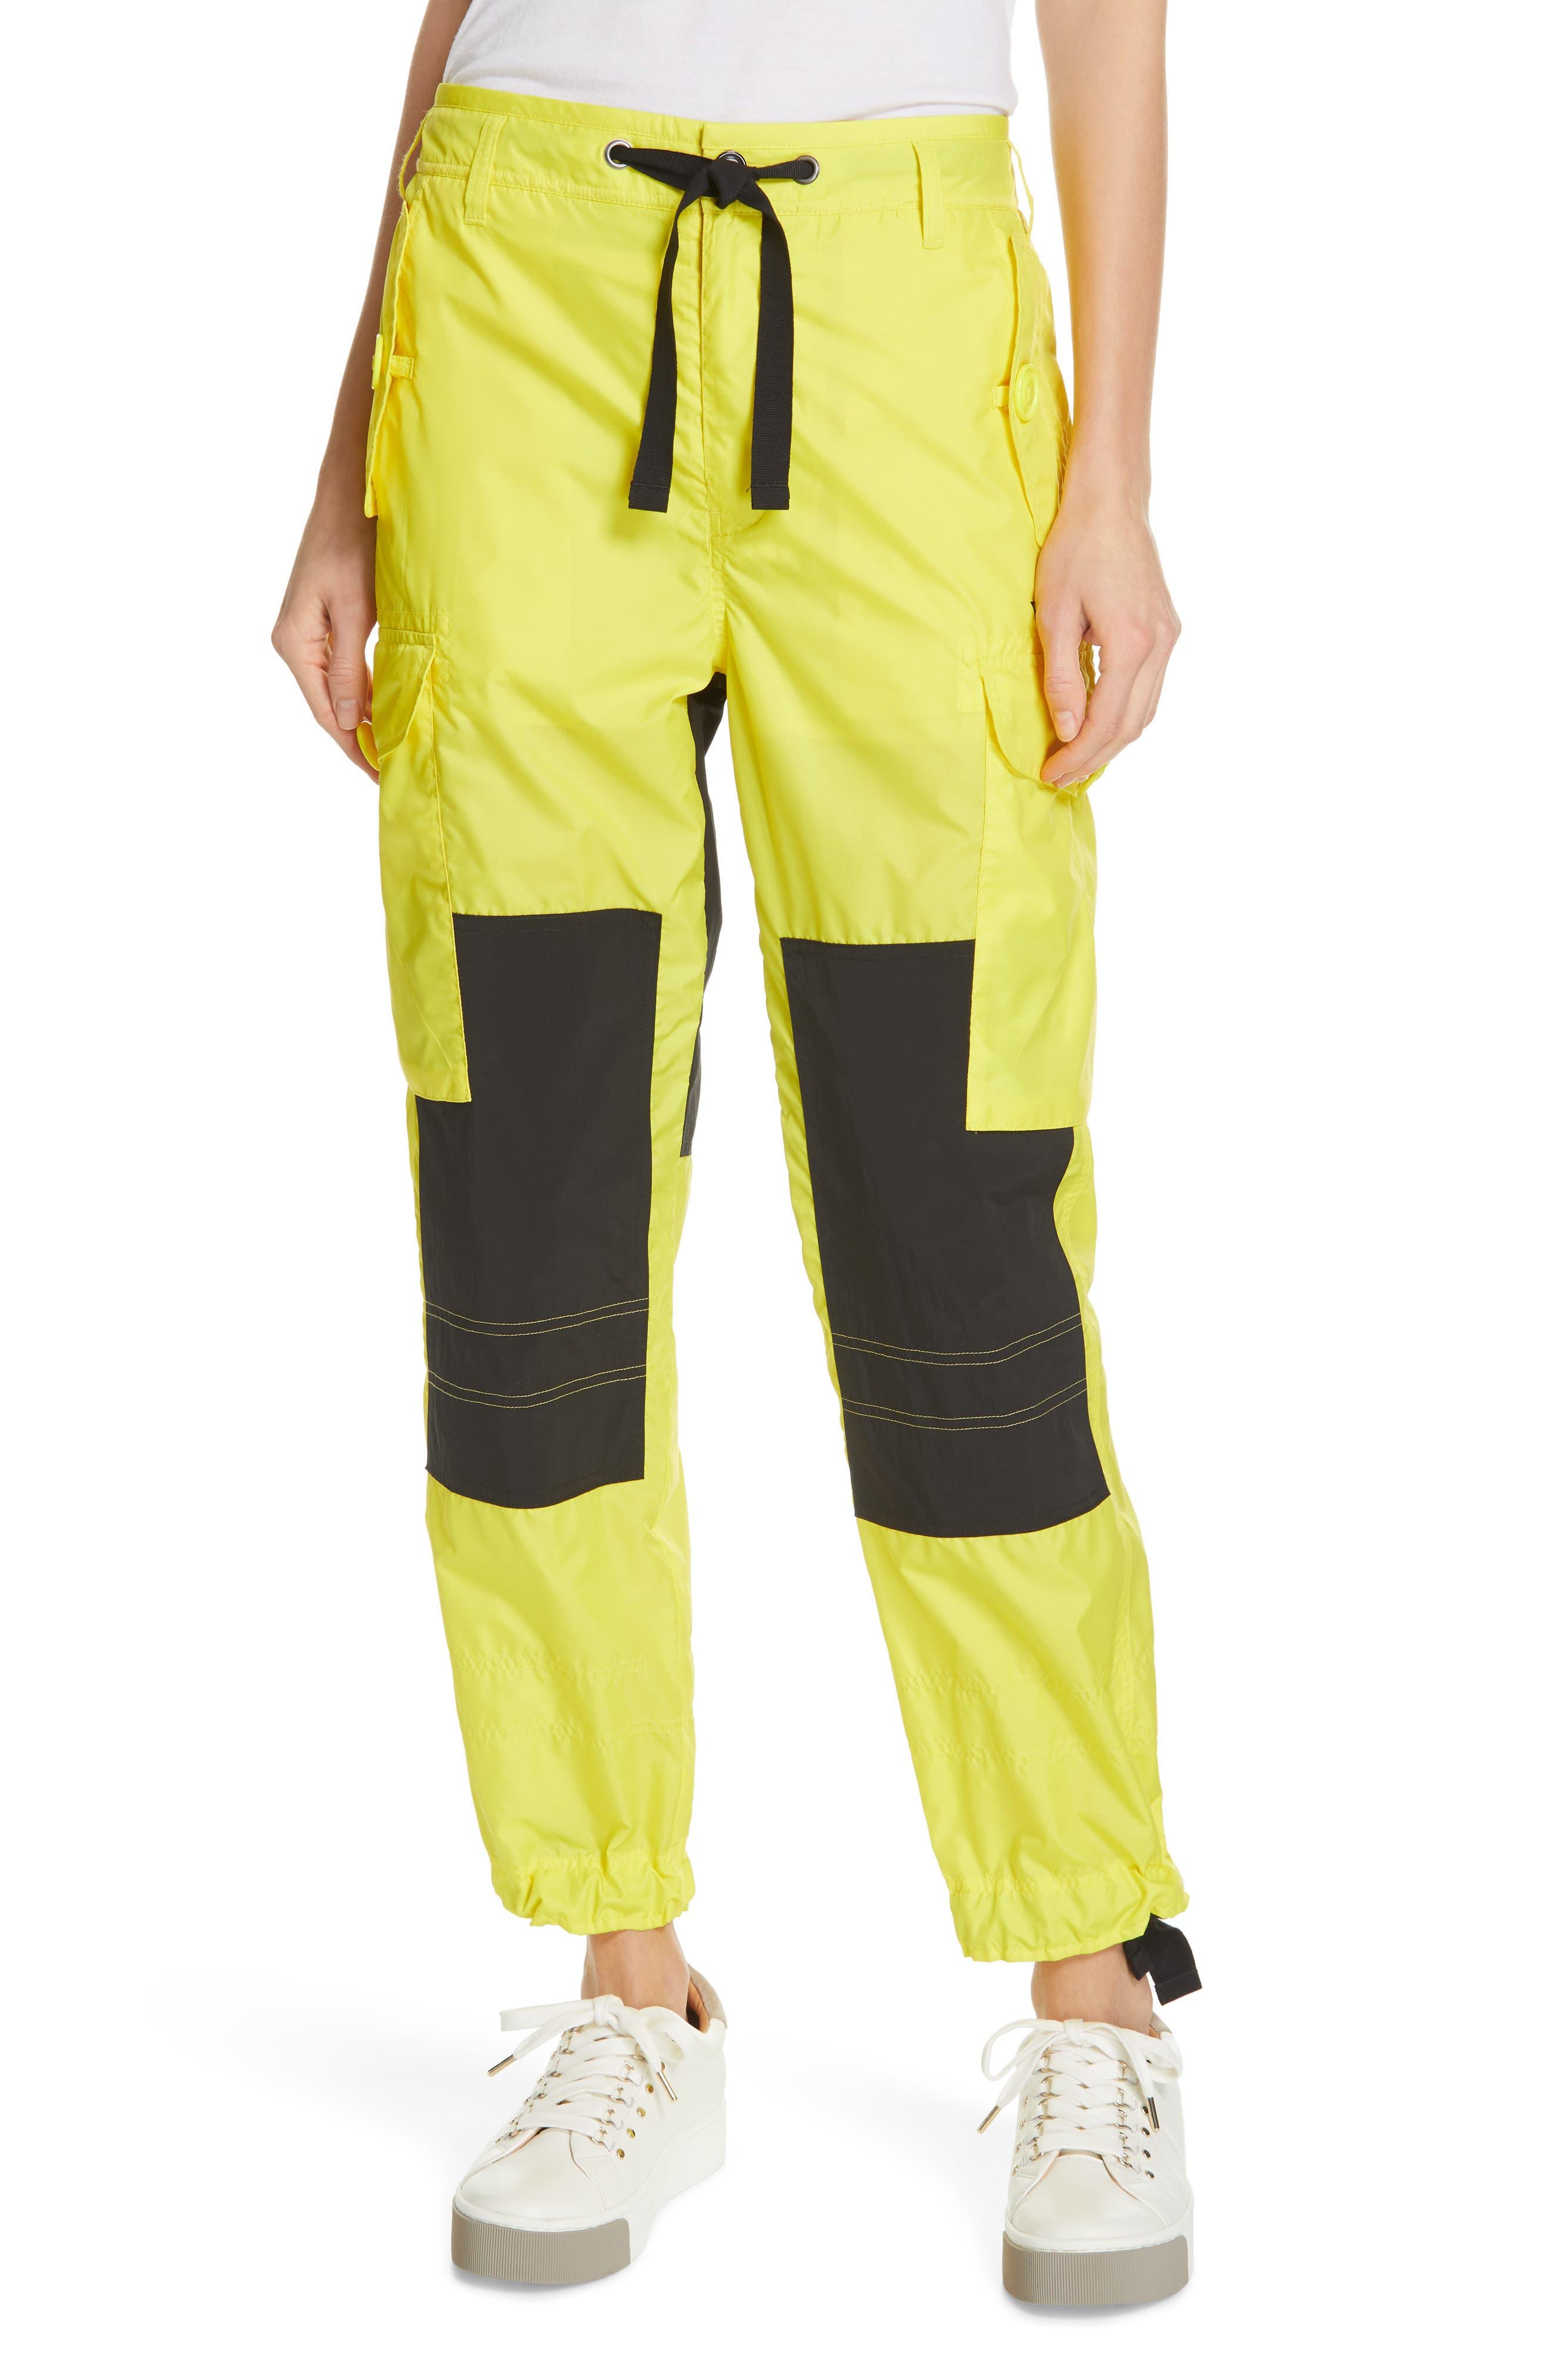 Polo Ralph Lauren Colorblock Cargo Pants, Yellow